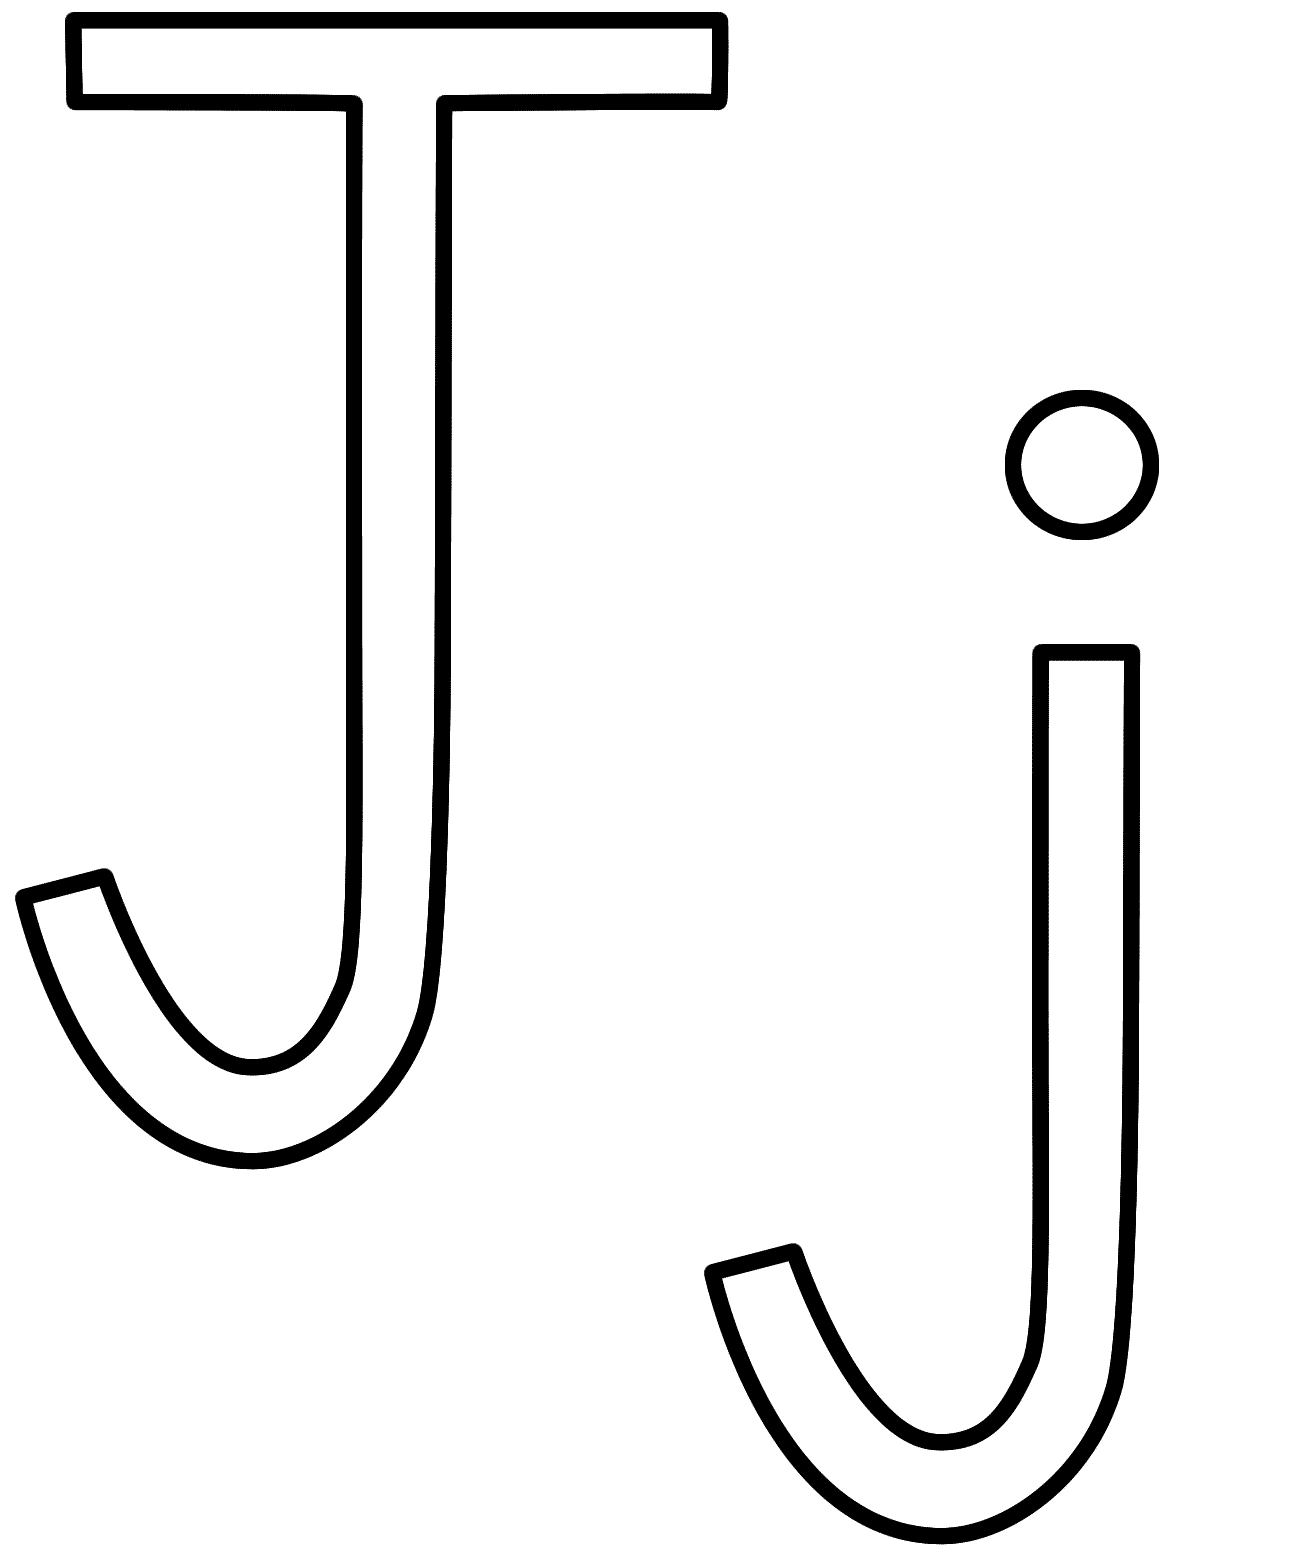 Letter J Coloring